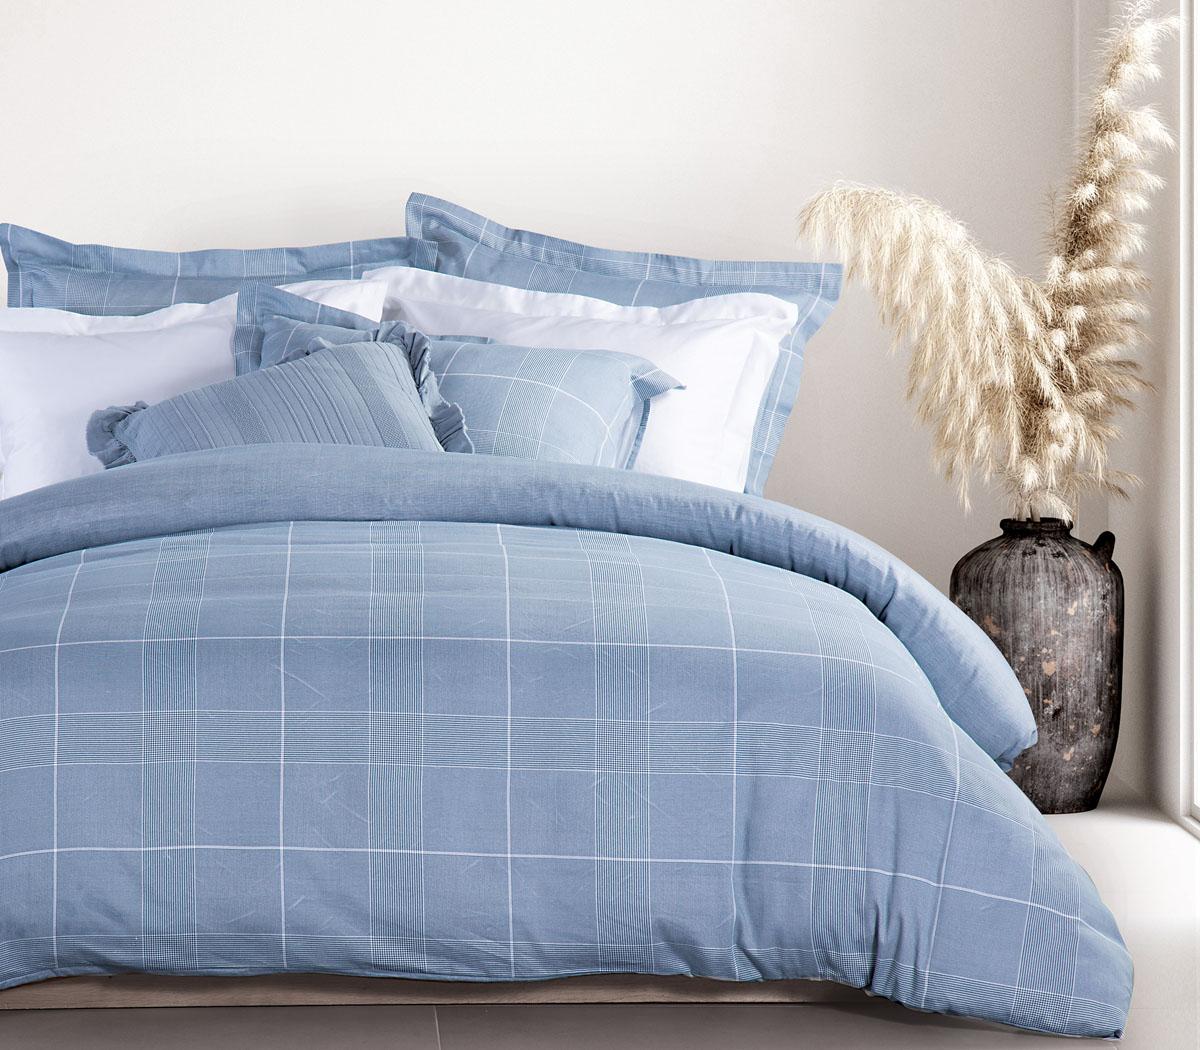 To κρεβάτι με το μπλε κουβερλί